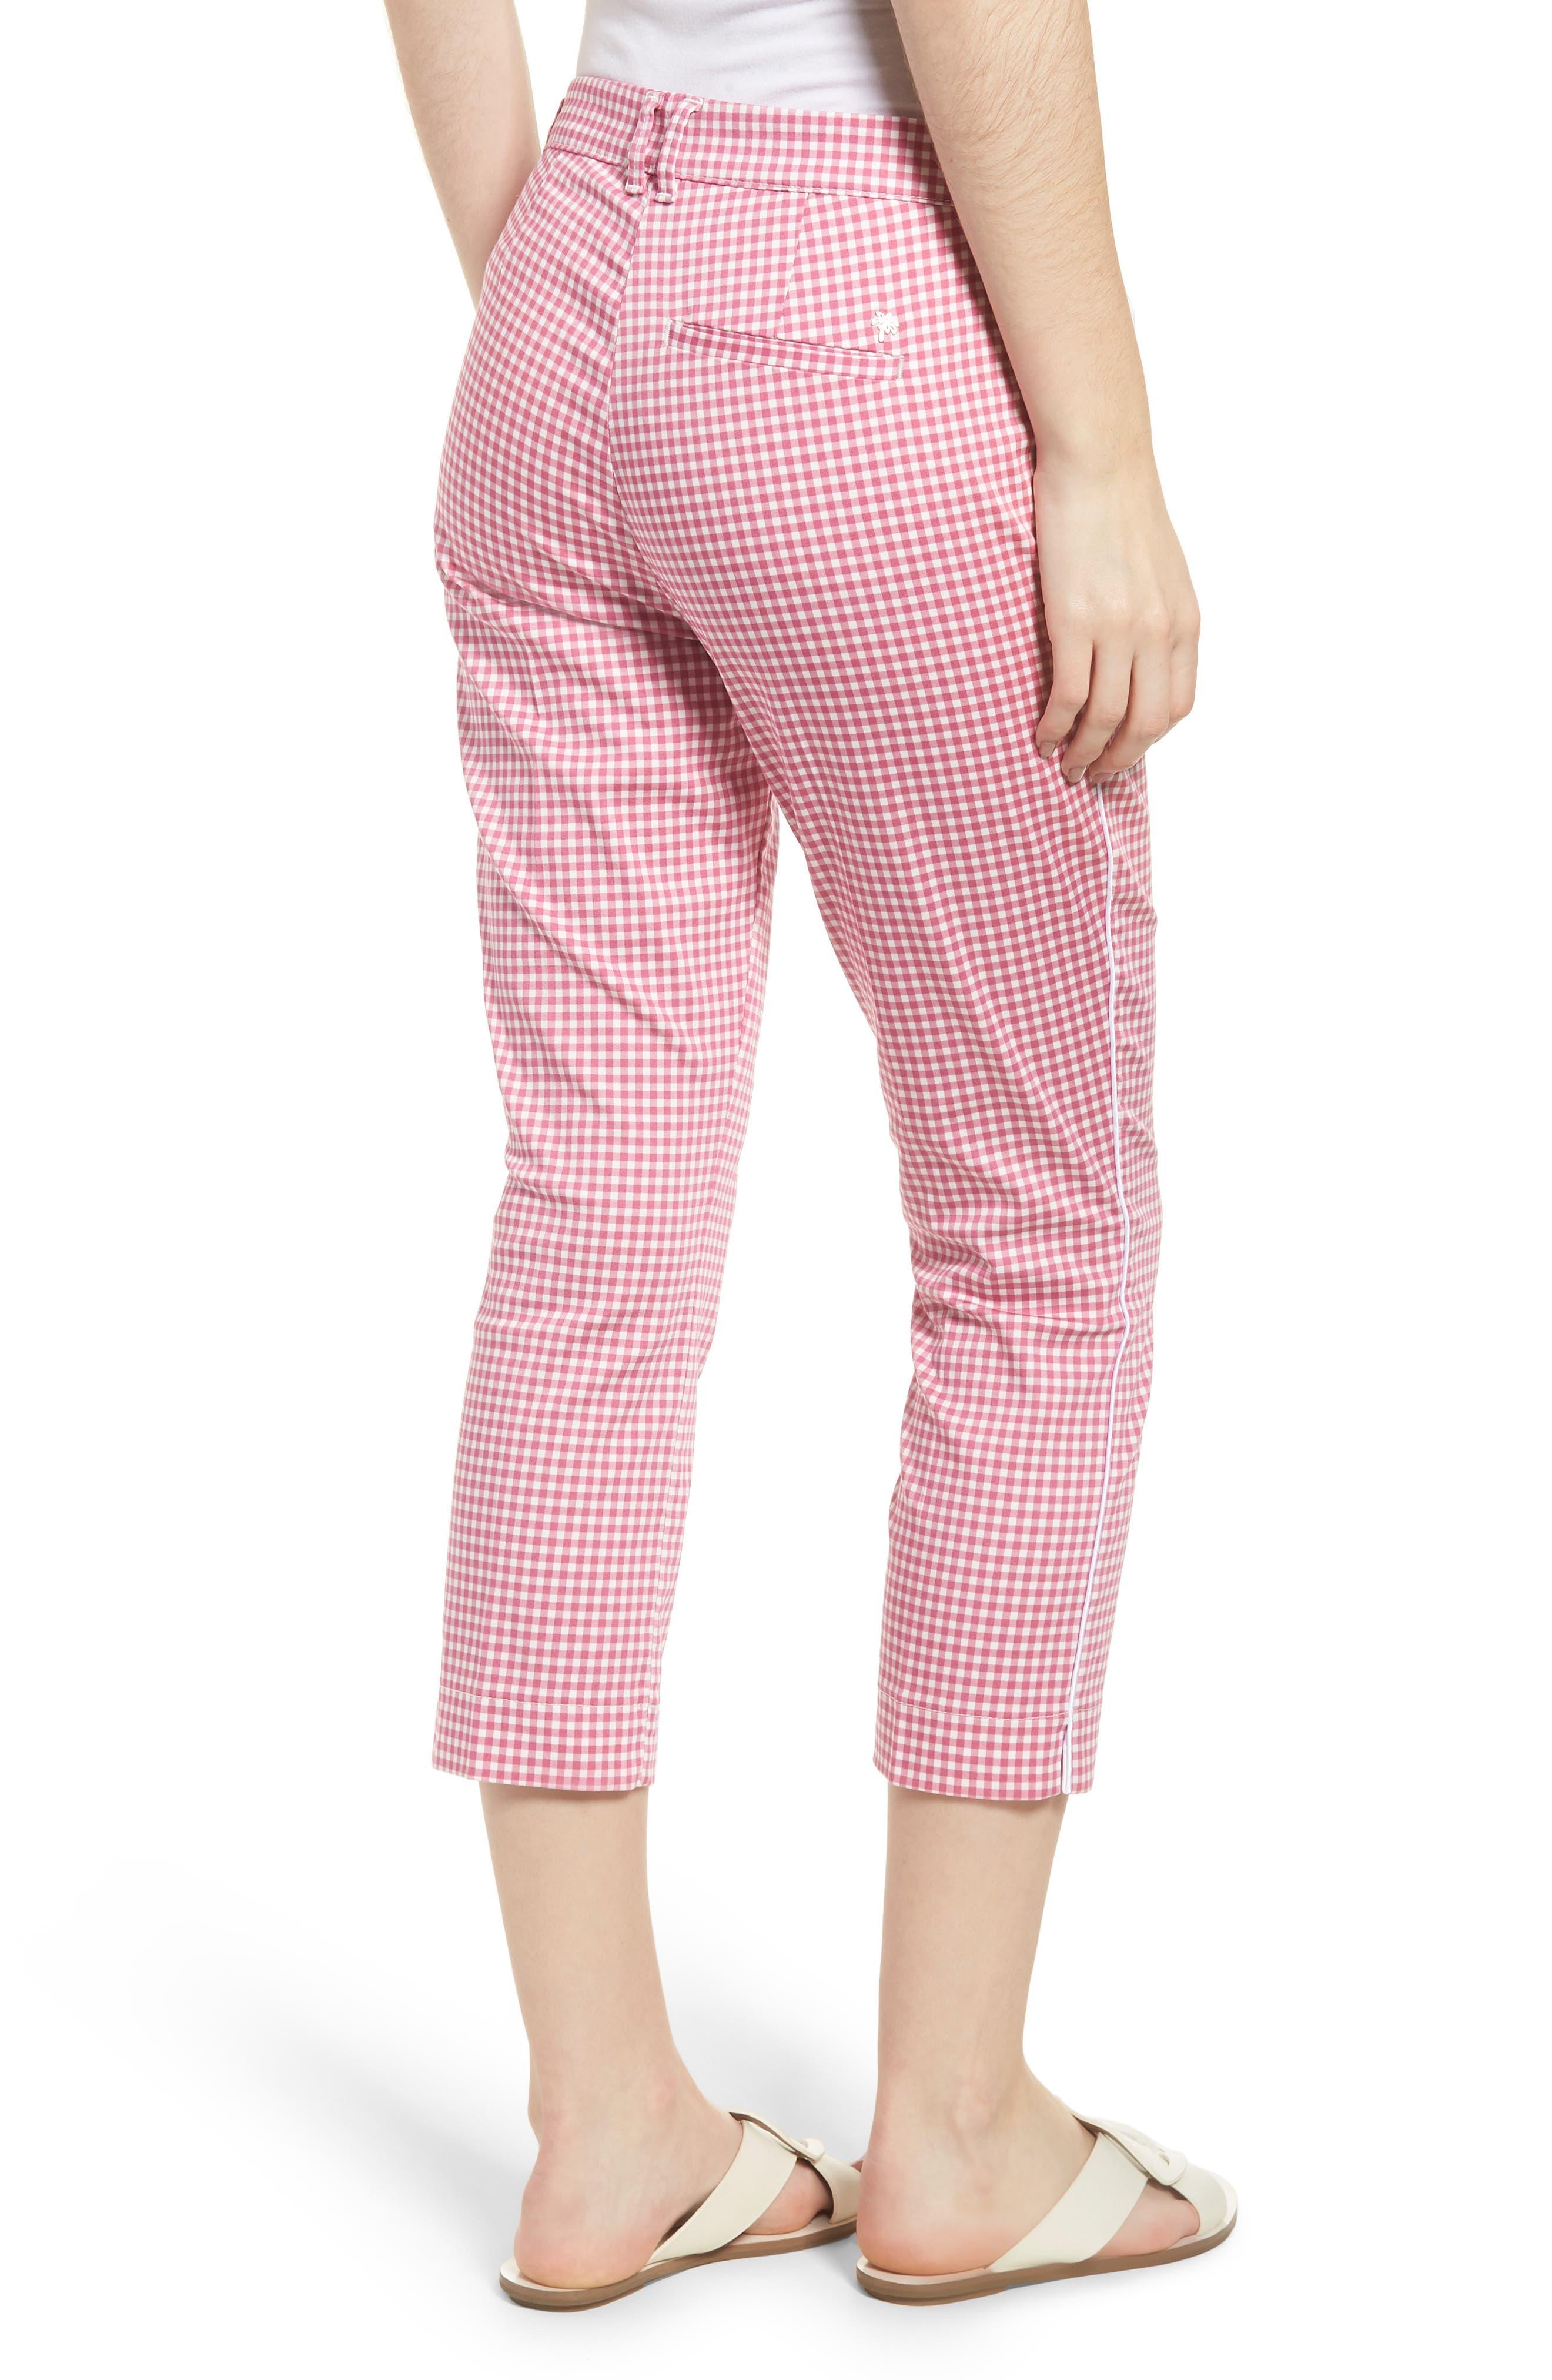 Maron Gingham Stretch Cotton Pants,                             Alternate thumbnail 2, color,                             Pink